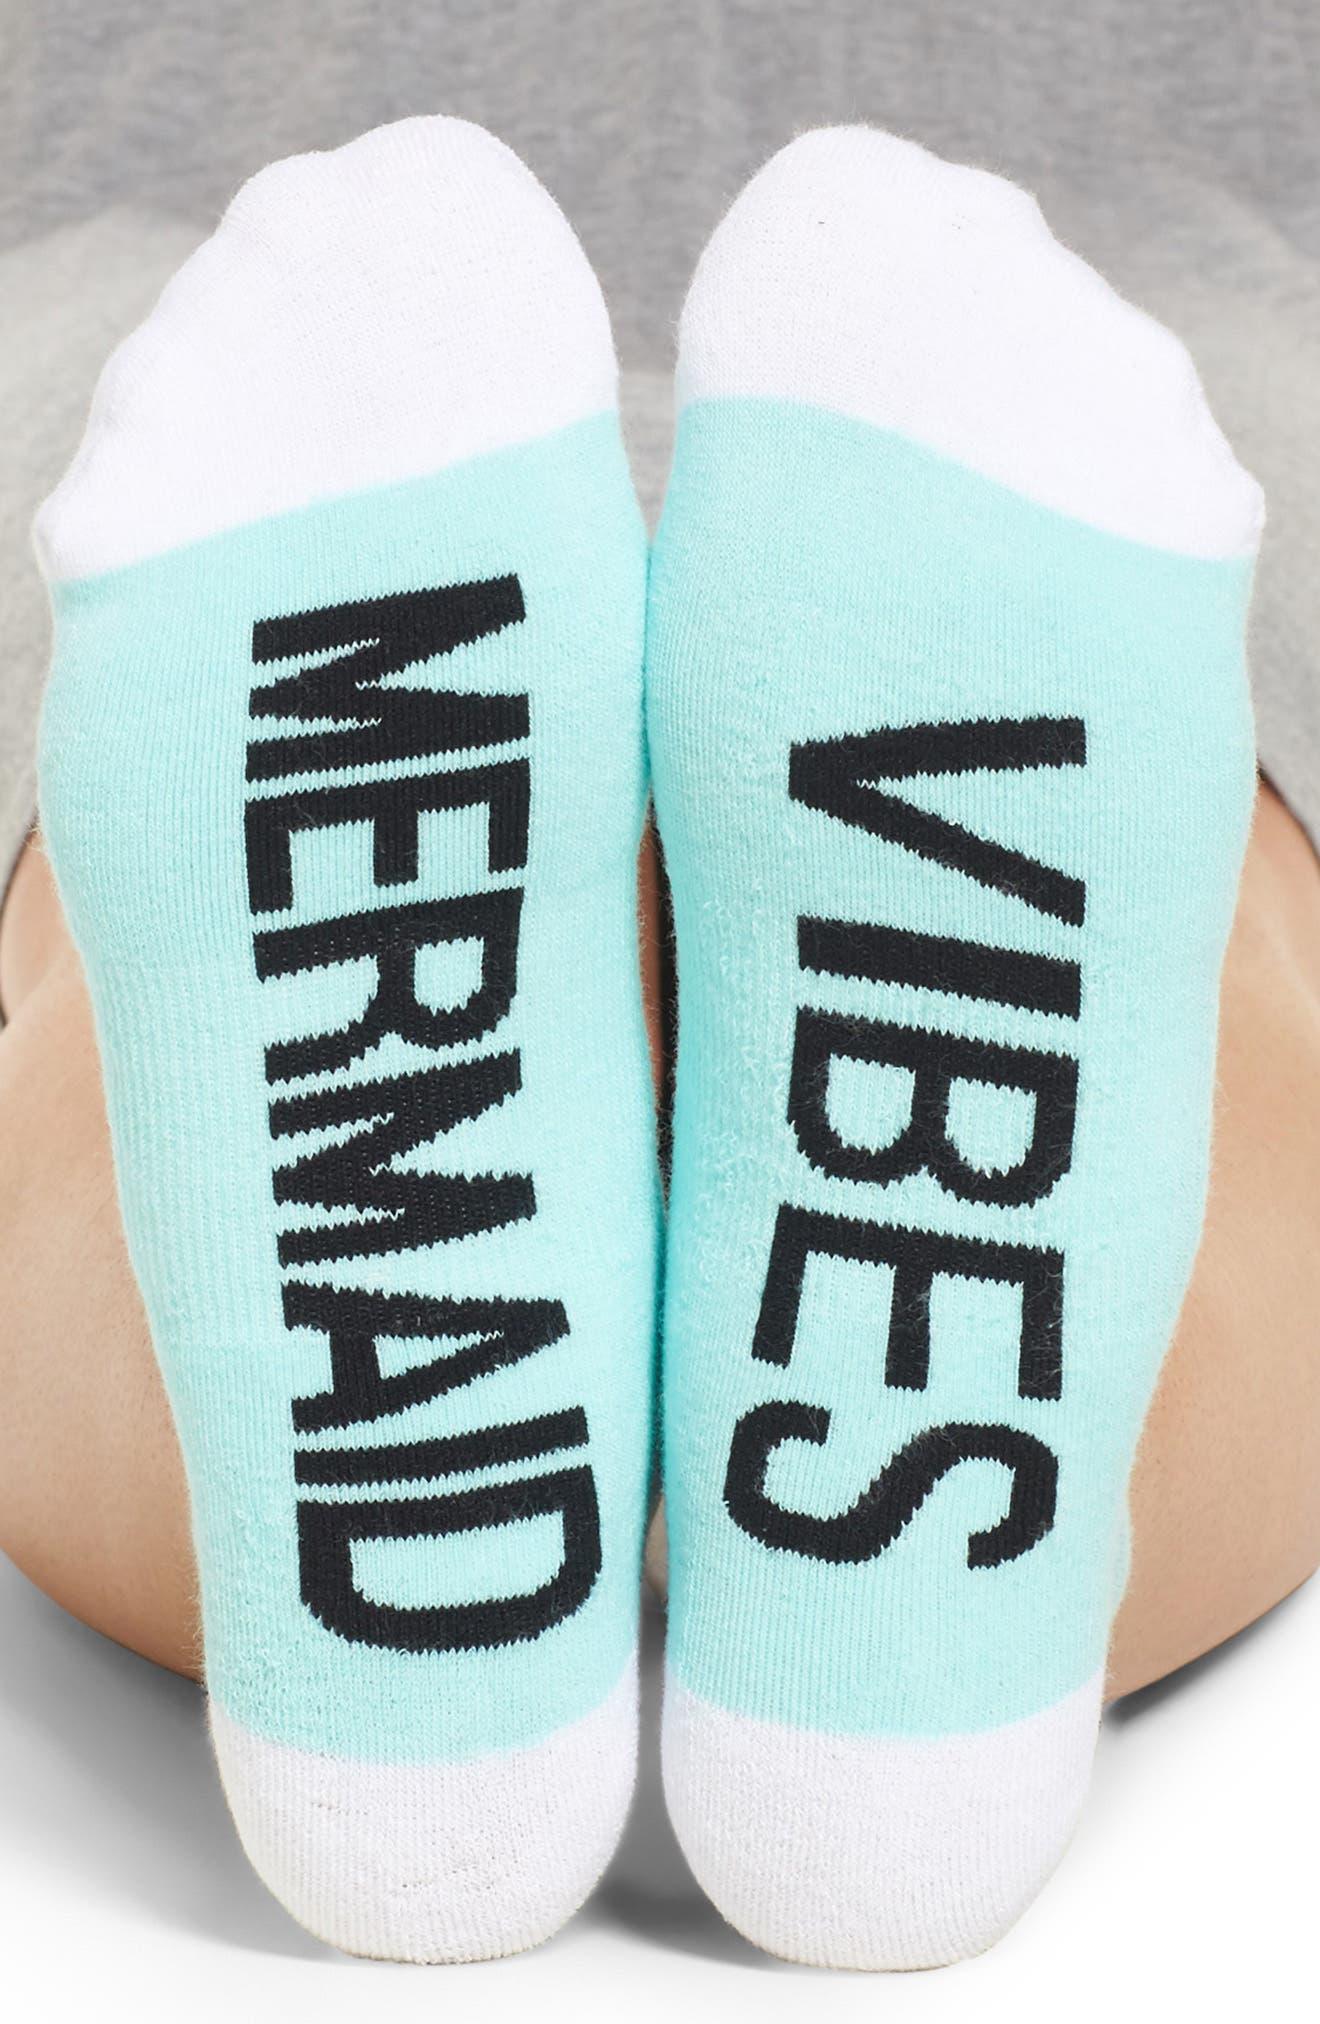 Alternate Image 1 Selected - SOCKART Mermaid Vibes Ankle Socks